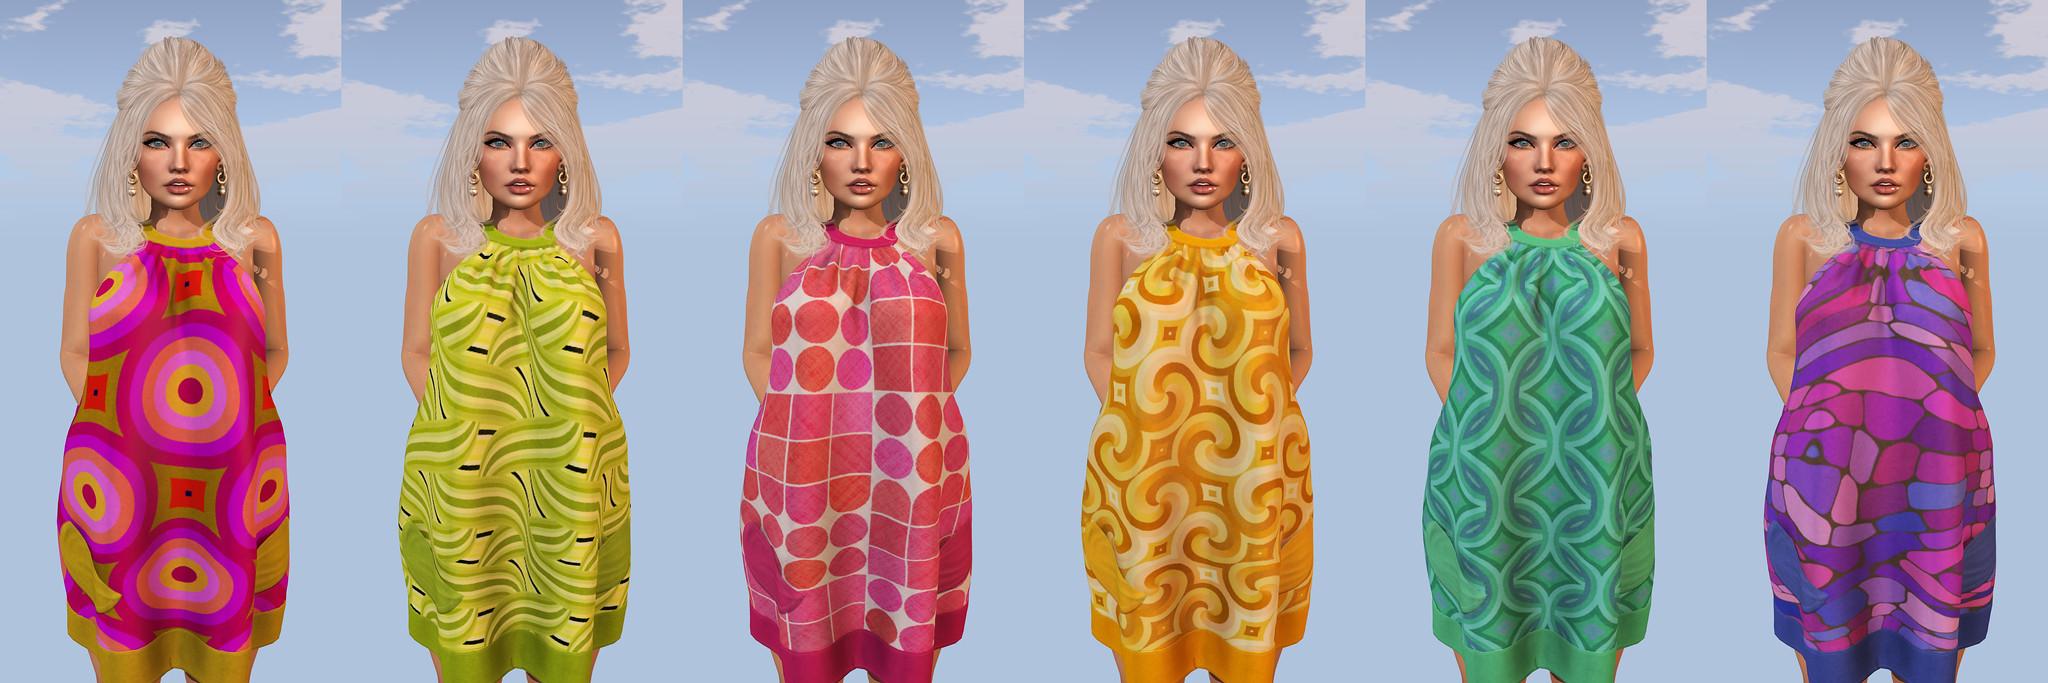 Maraschino - Dawn Dress (Acid, Avocado, Lippy, Mellow, Peacock, Trippy)